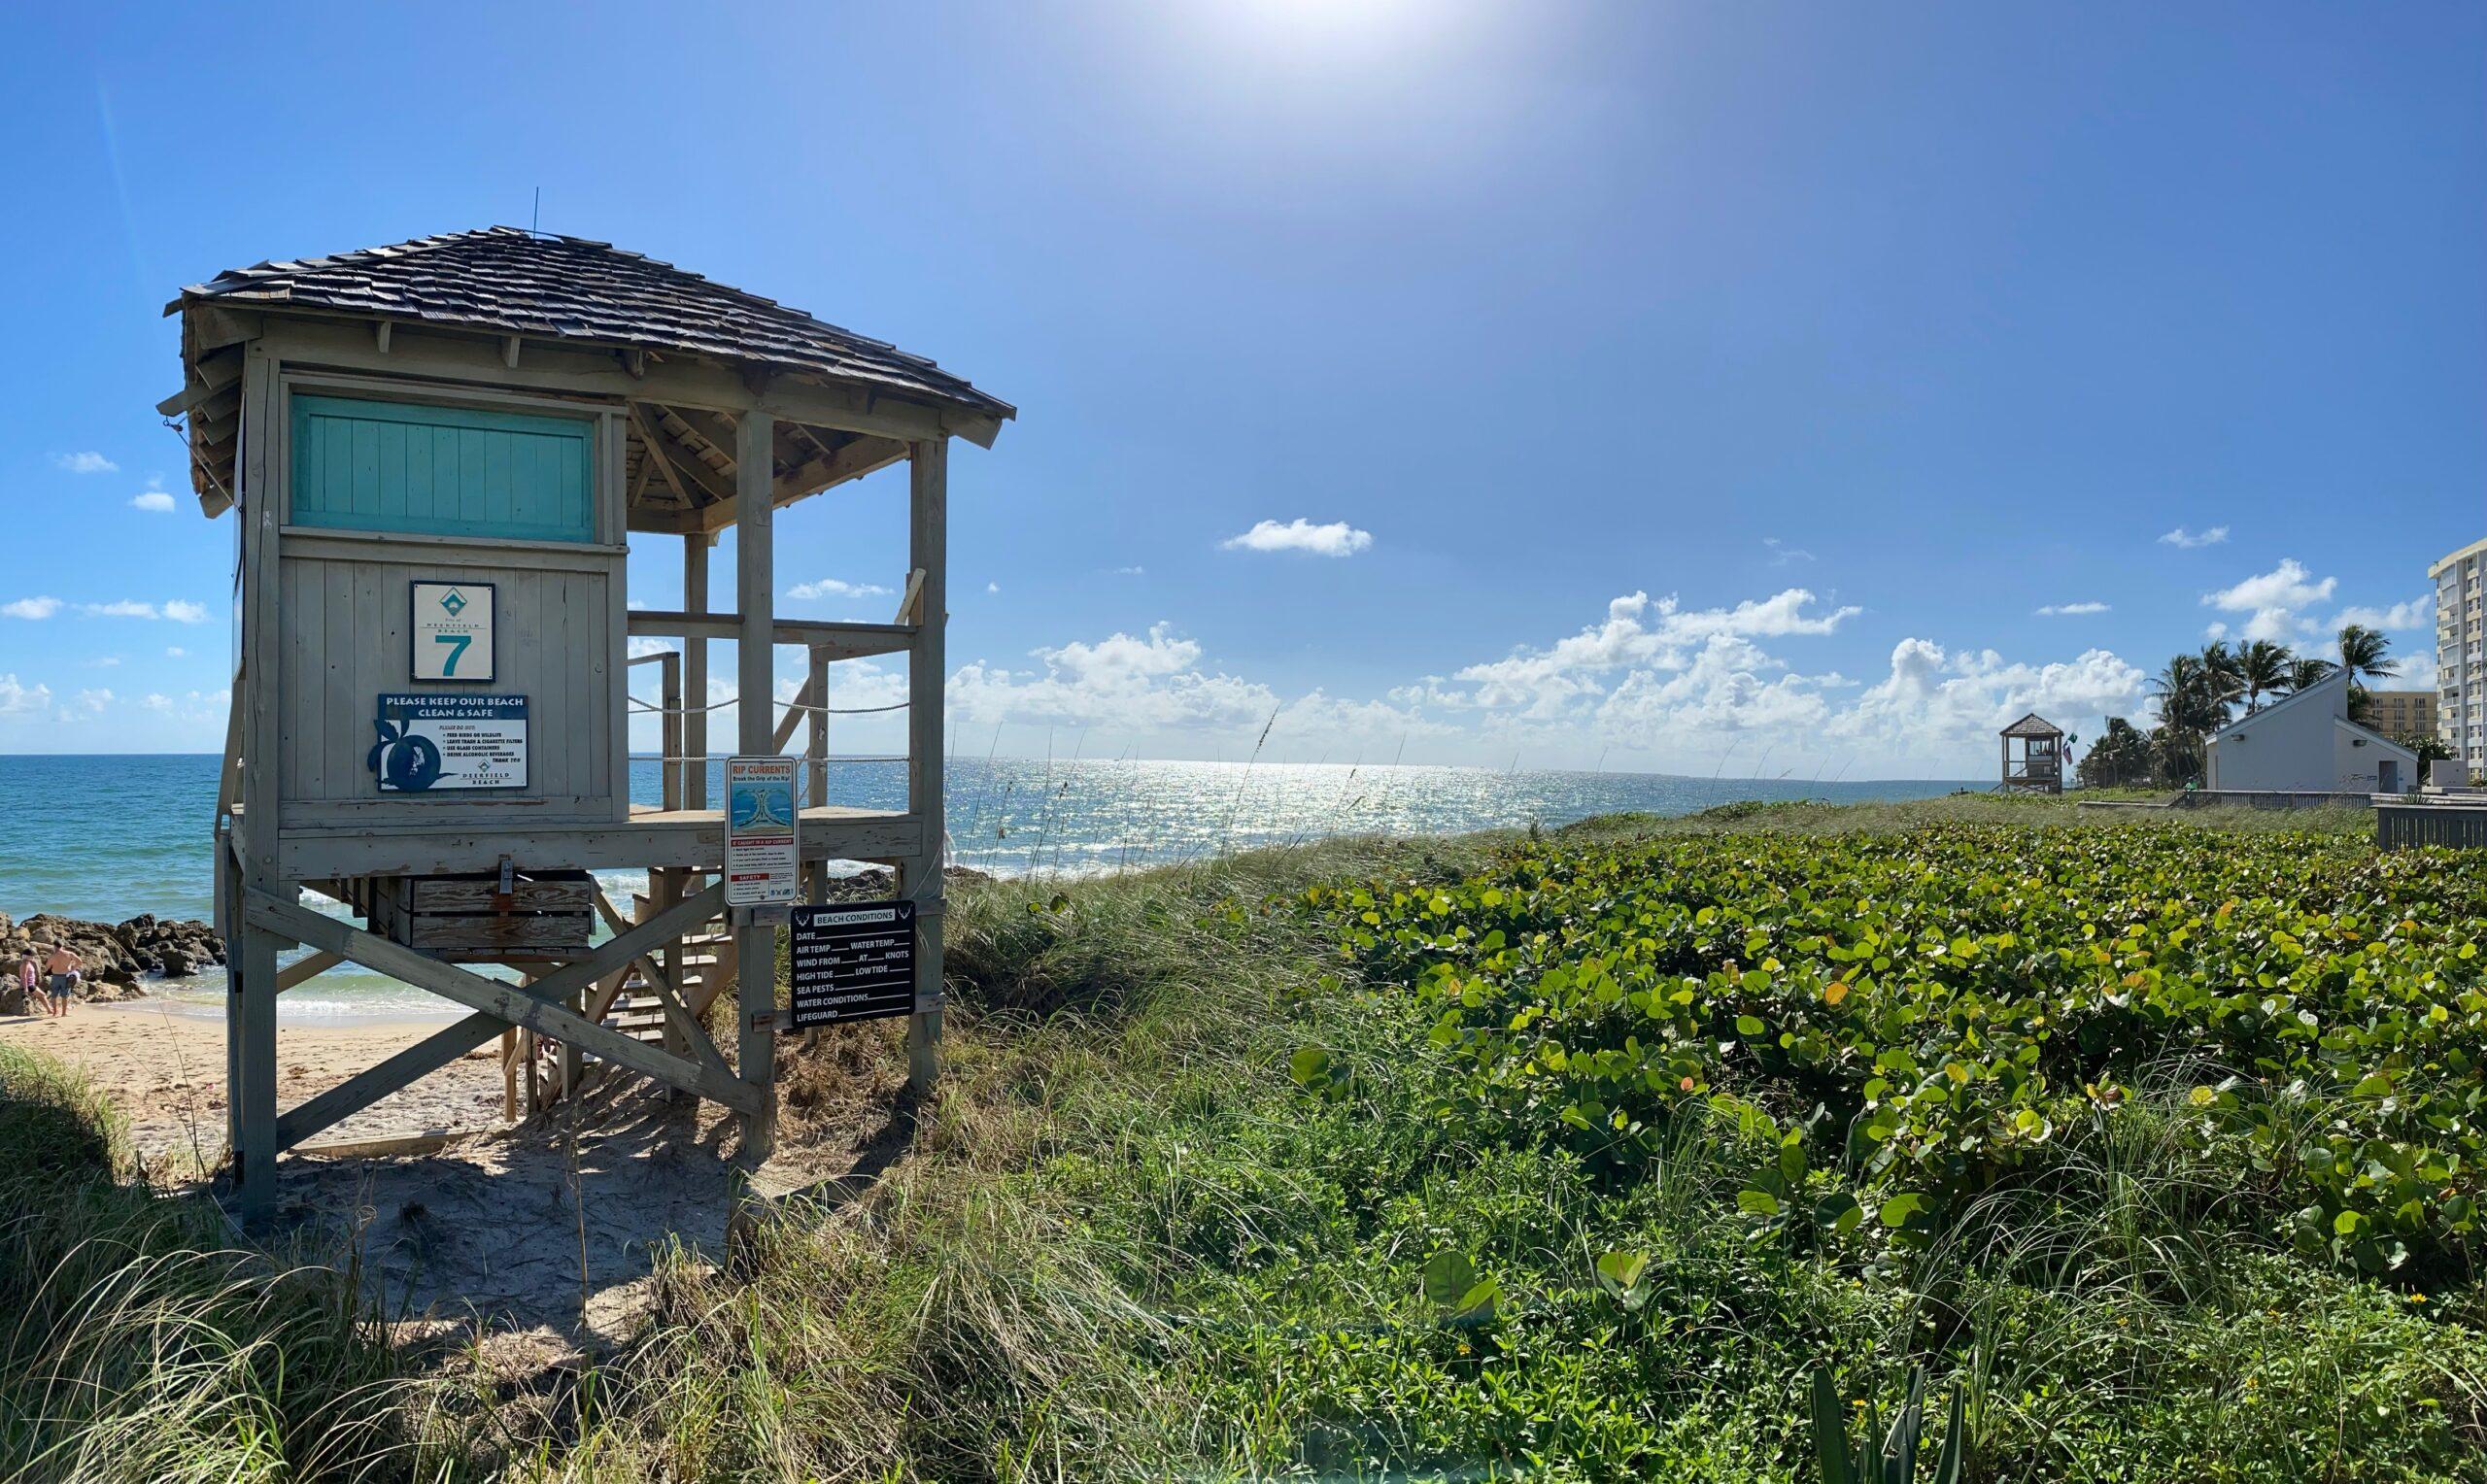 Sober living in Deerfield Beach